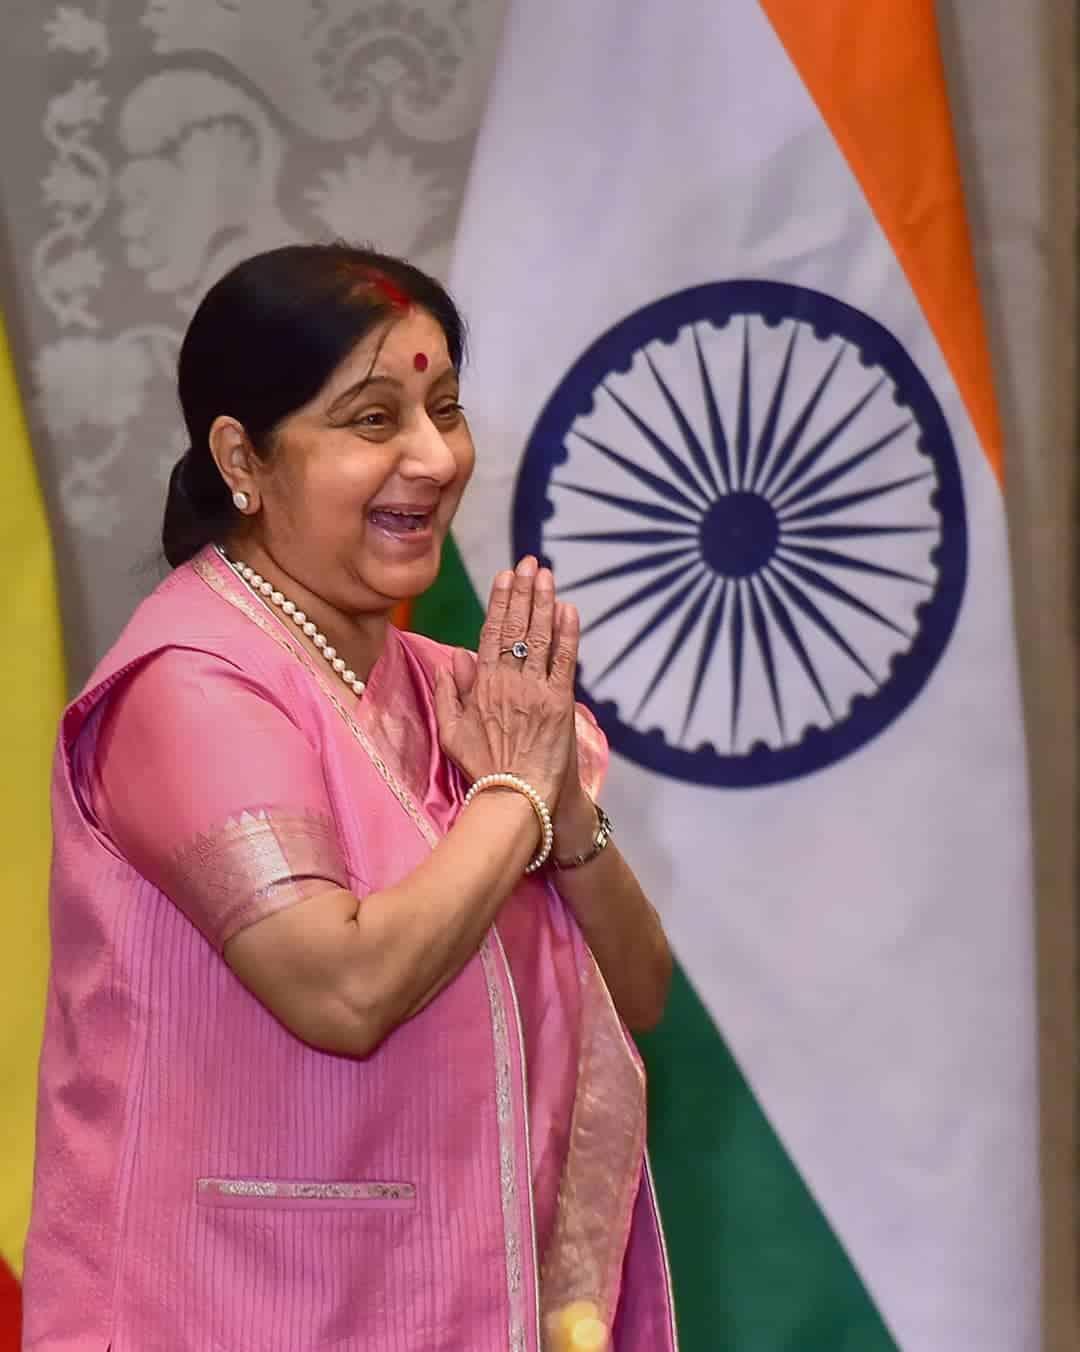 Sushma Swaraj Wiki, Age, Biography, Husband, Net Worth & More 3